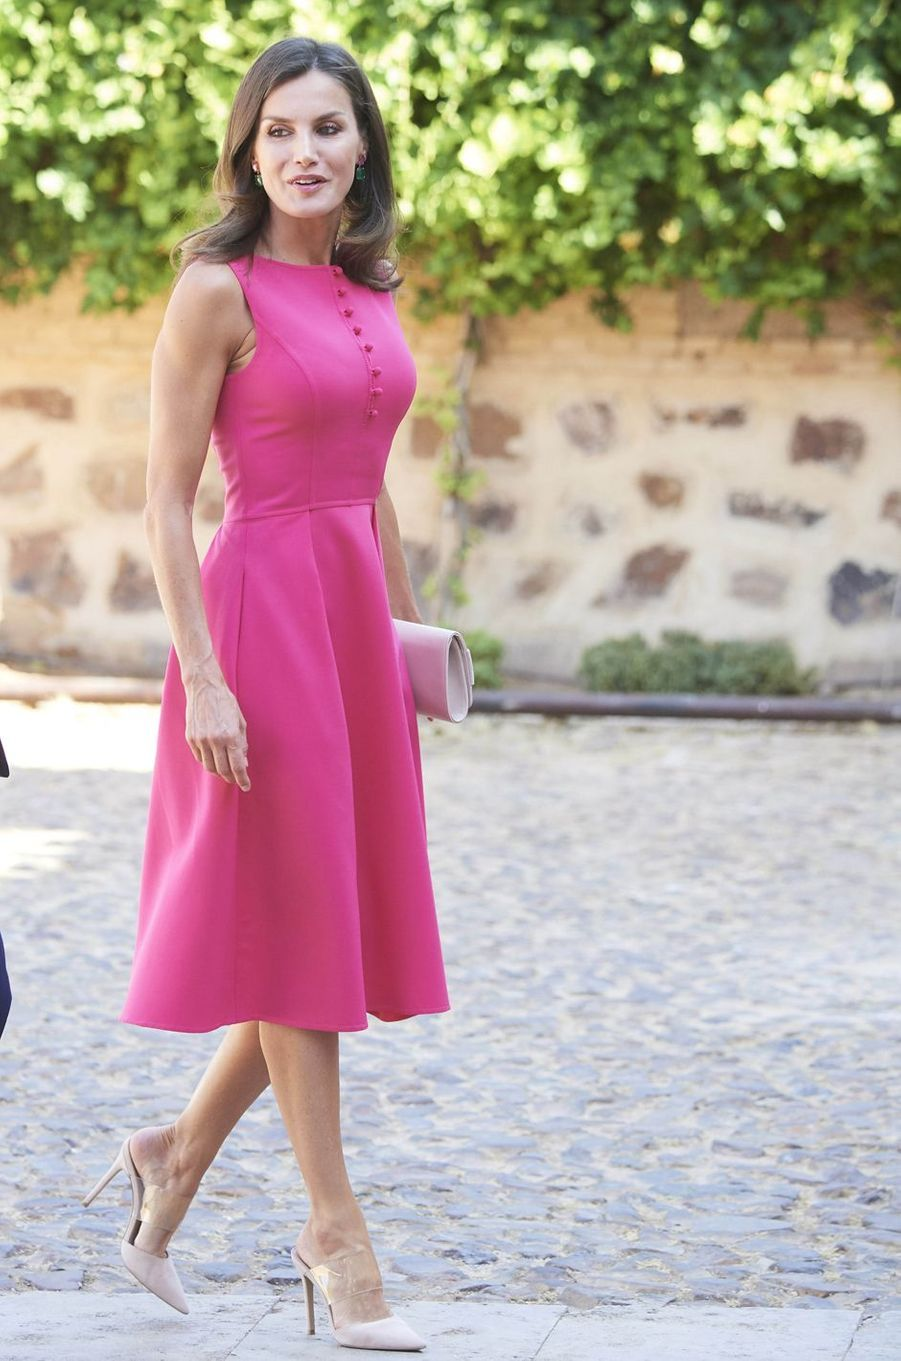 La reine Letizia d'Espagne dans une robeCarolina Herrera à Almagro, le 9 juillet 2019